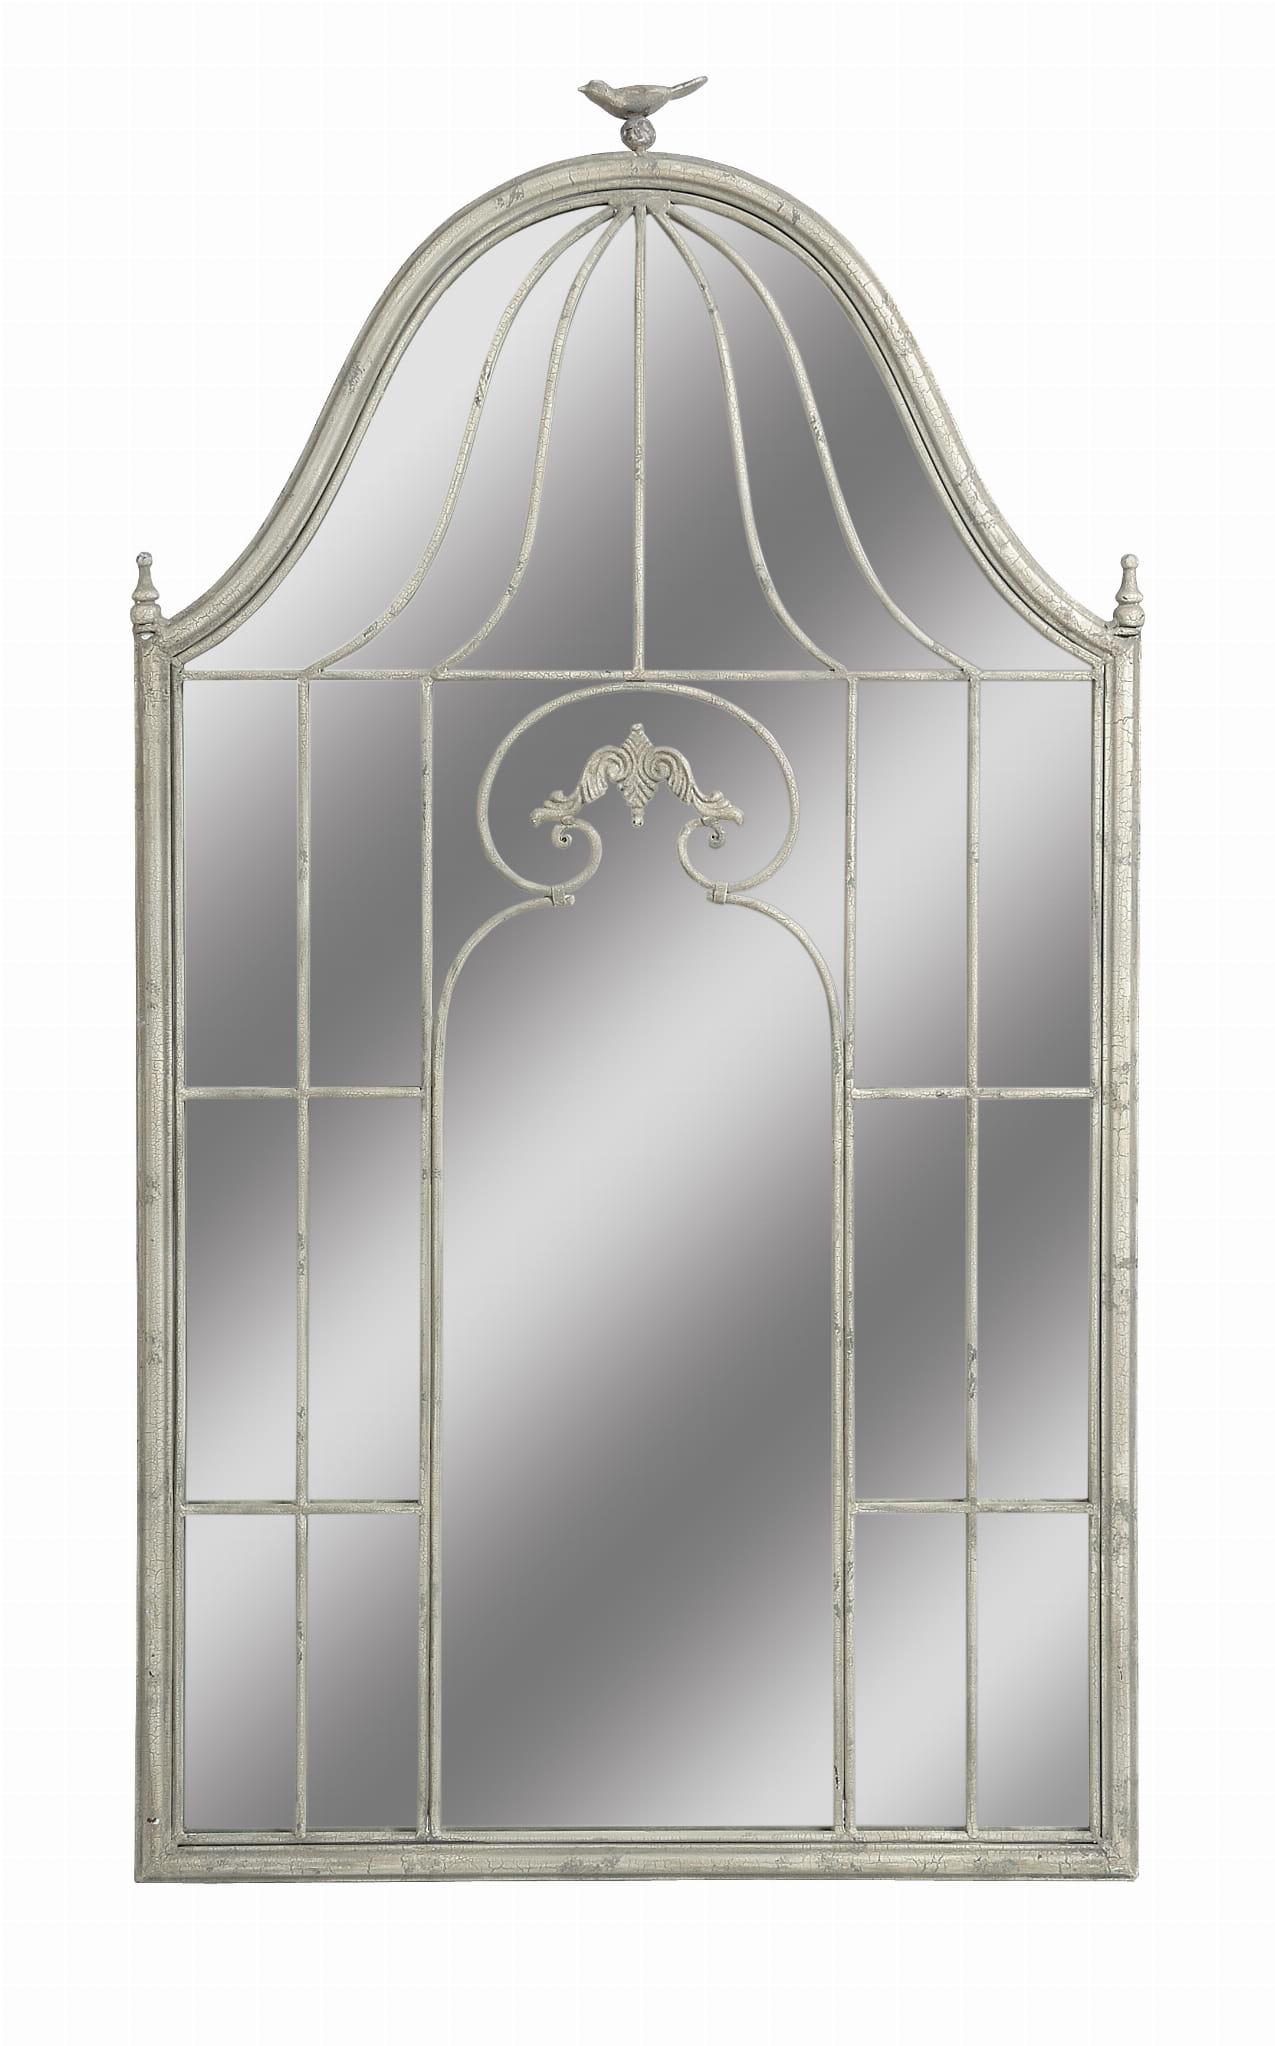 Belldeco Lustro Dekoracyjne Z Motywem Garden Metal Szkło 128x72x35 Cm Bdc036qkl